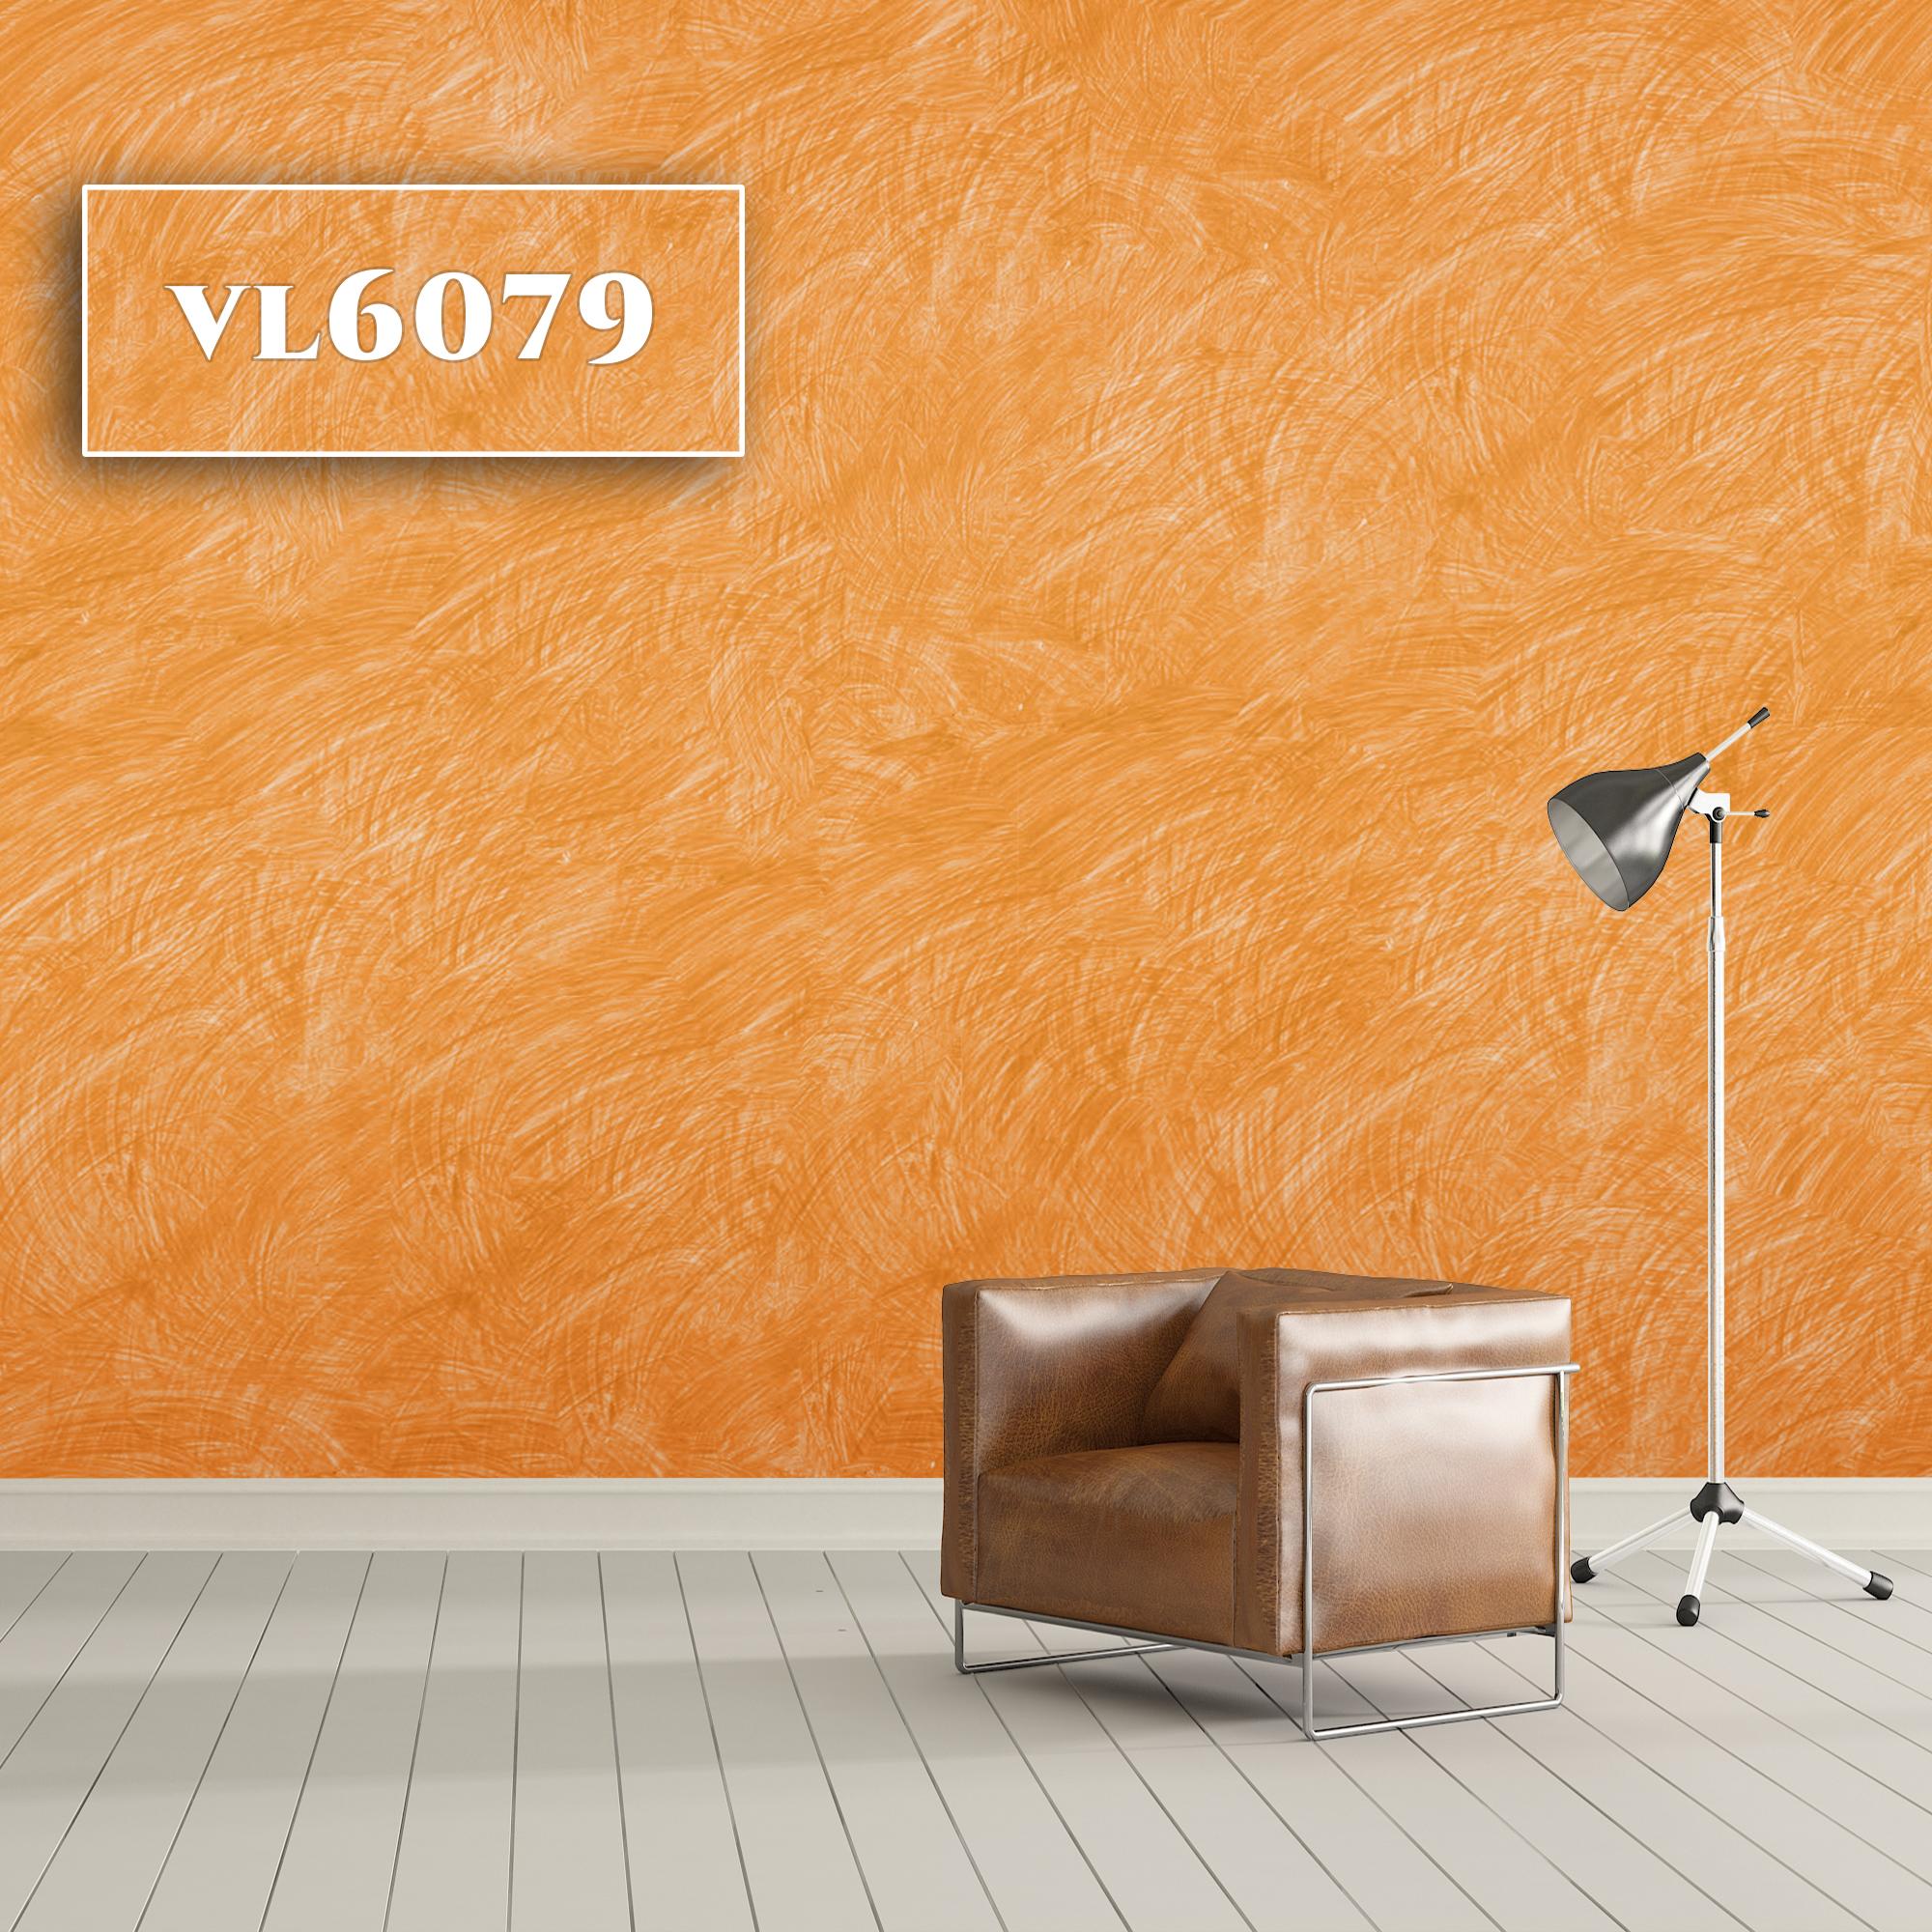 VL6079